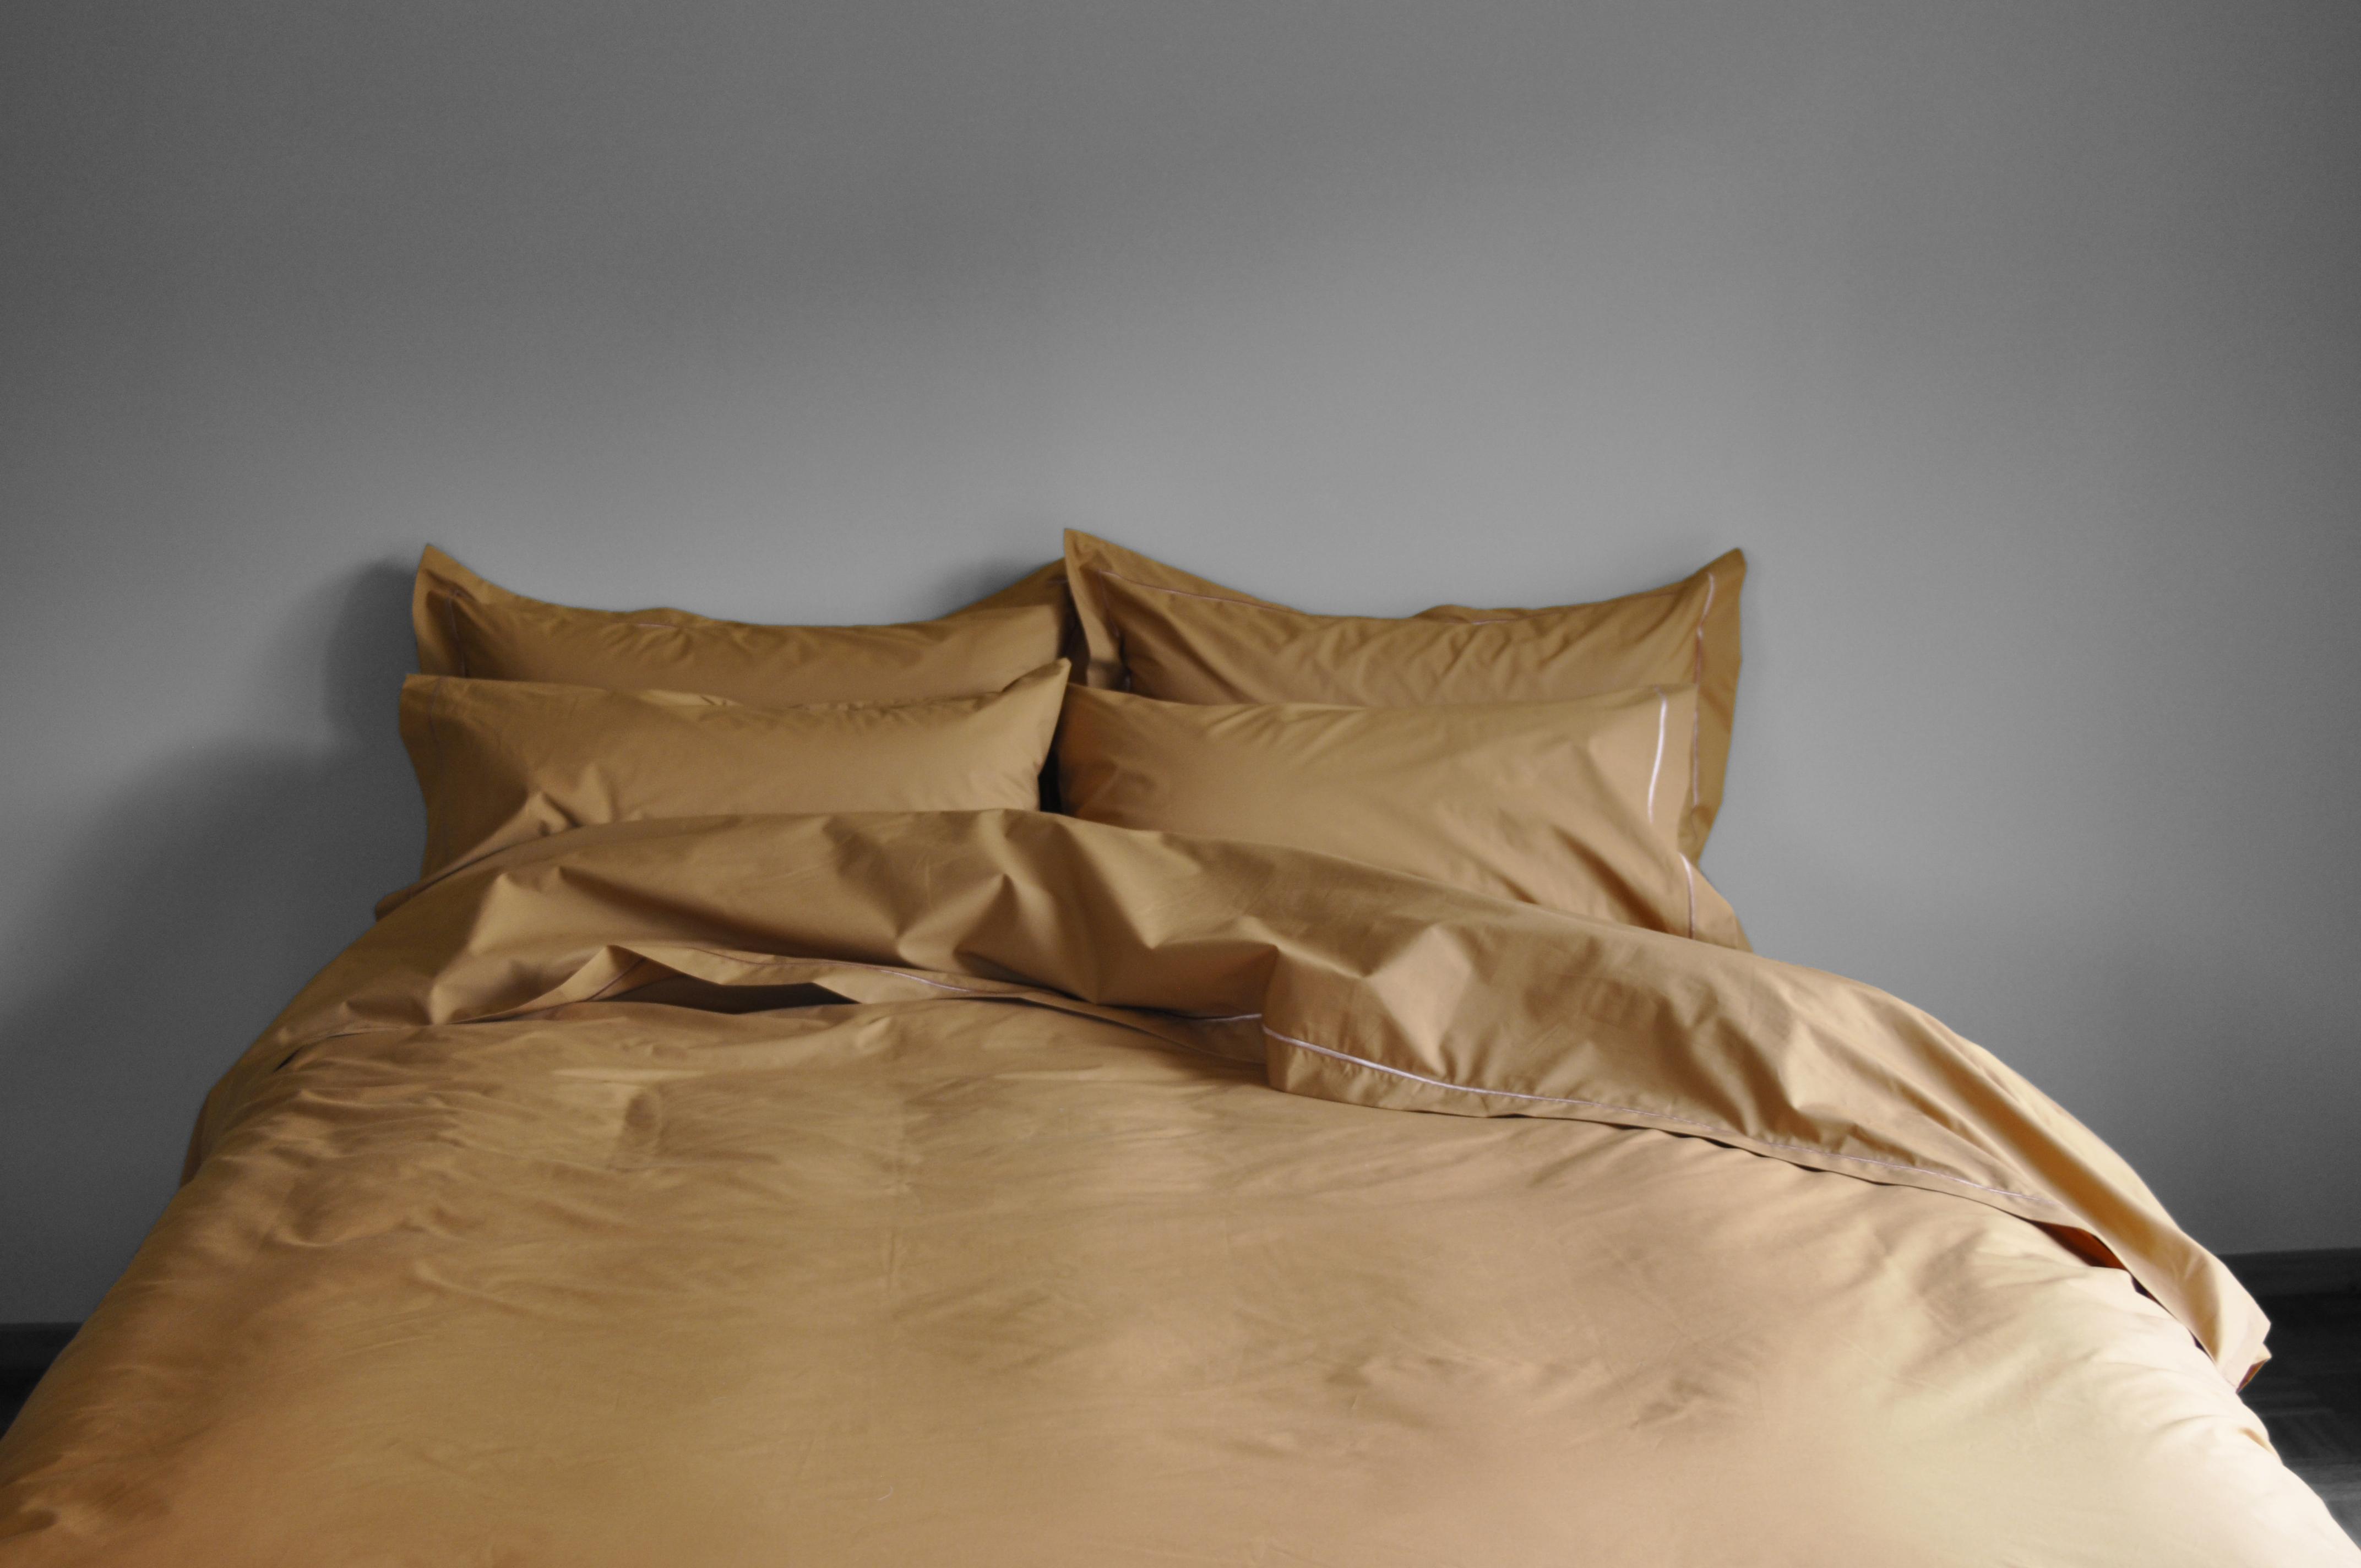 Rust Quilt Cover